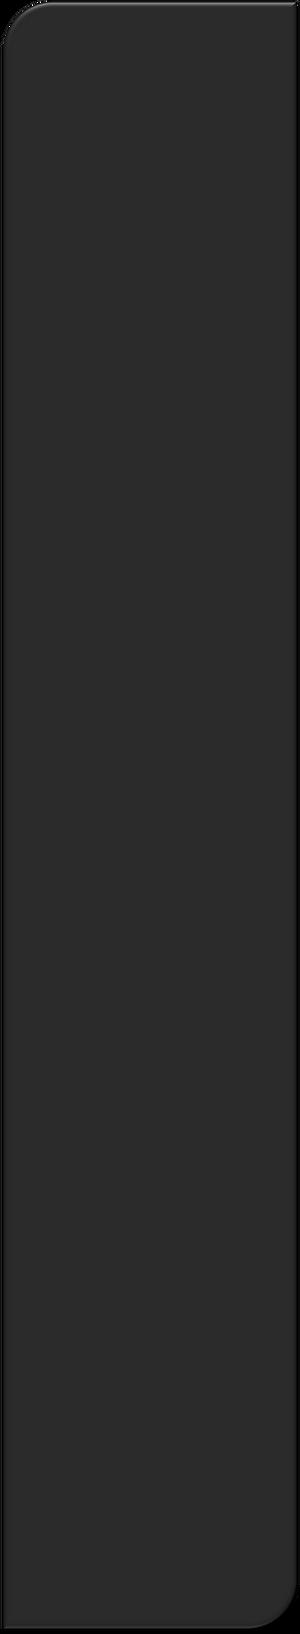 41-bac-M-2020.png